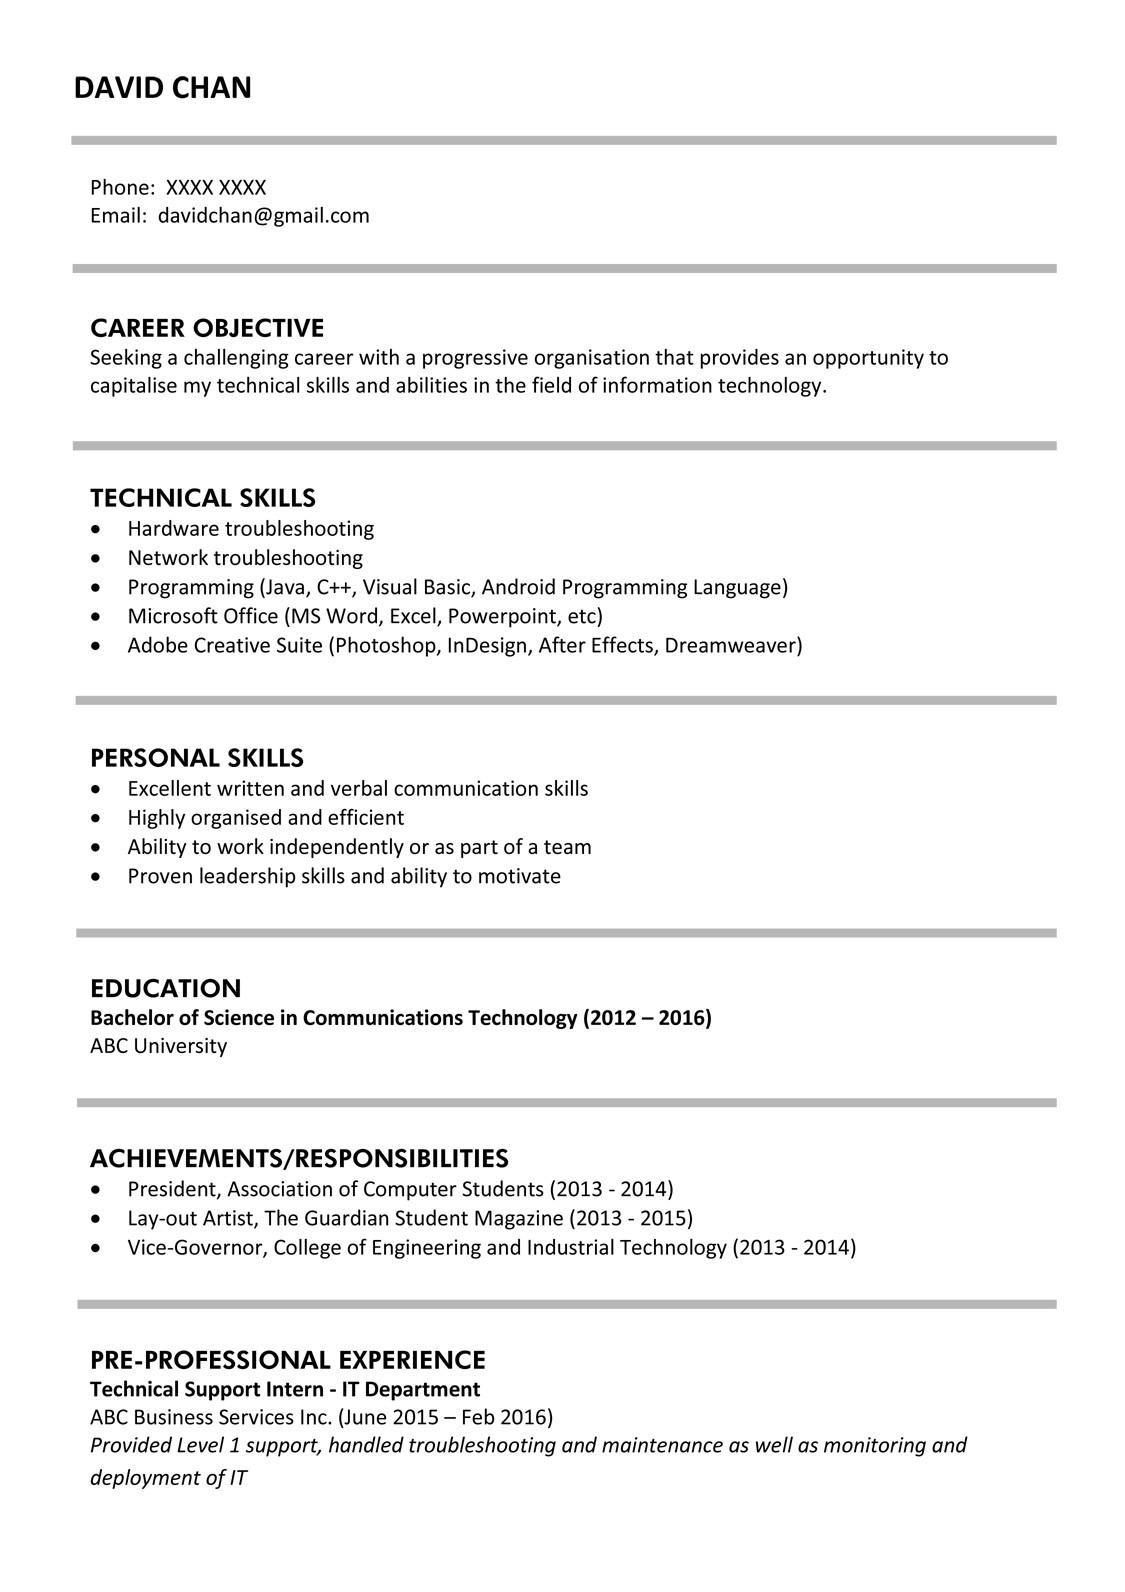 sample resume for it fresh graduates